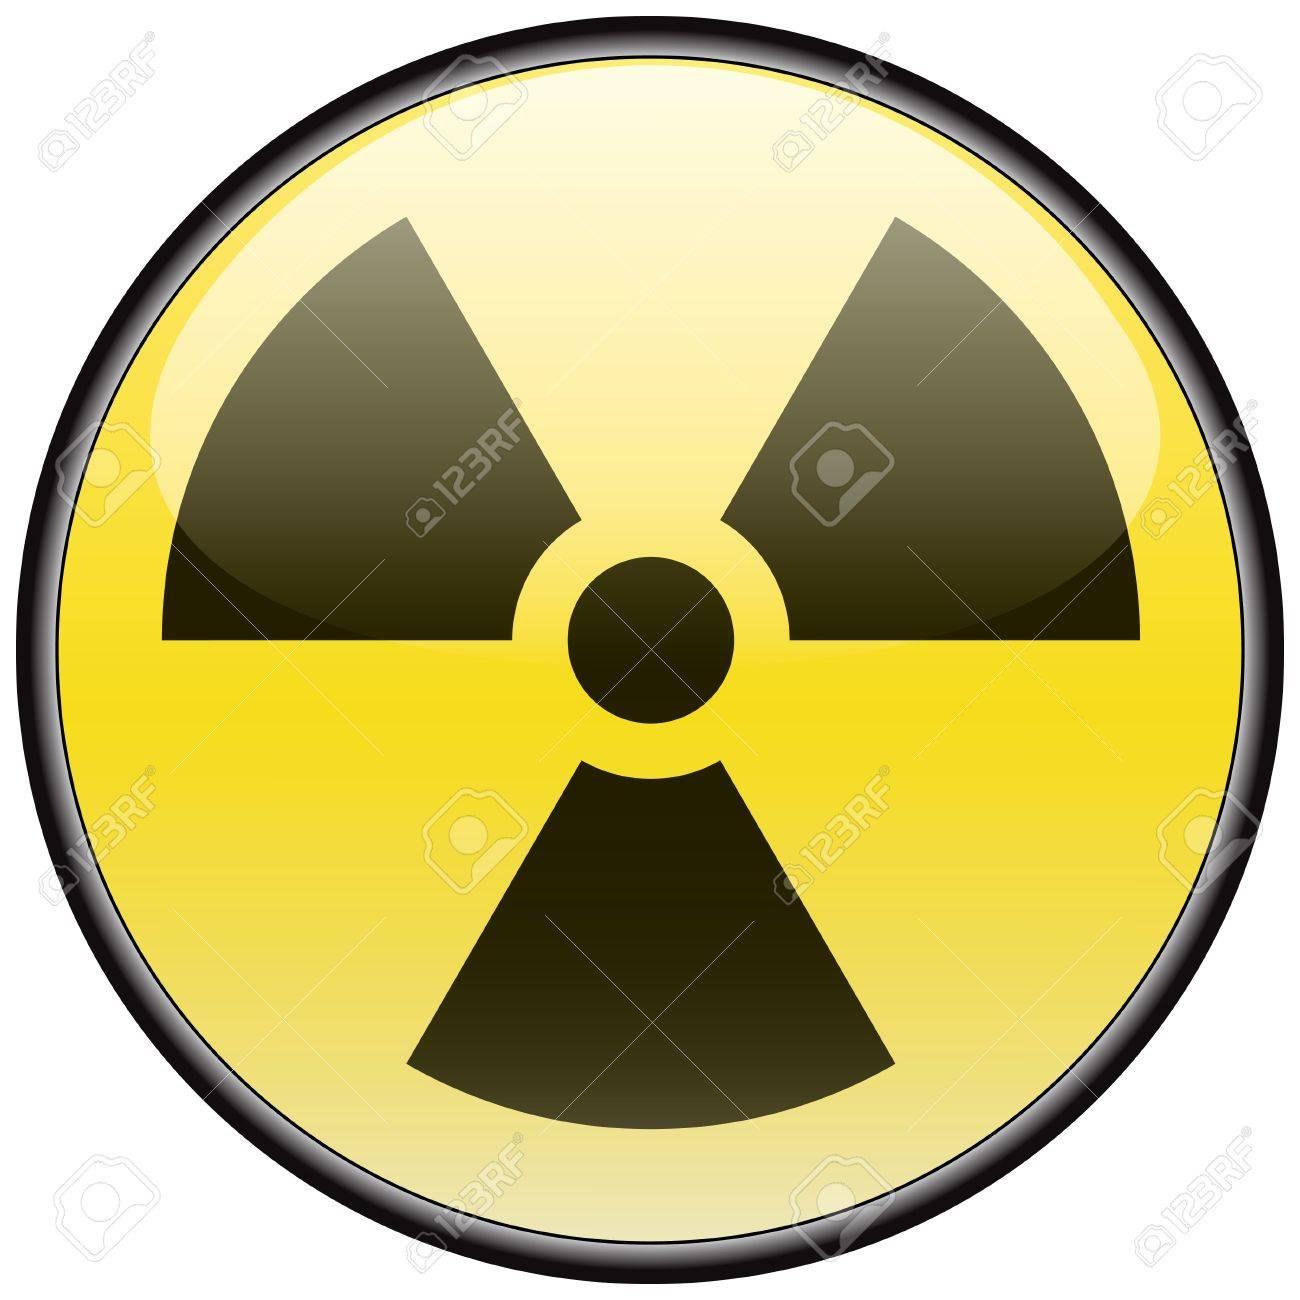 Radiation vector round hazardous sign Stock Vector - 8504274